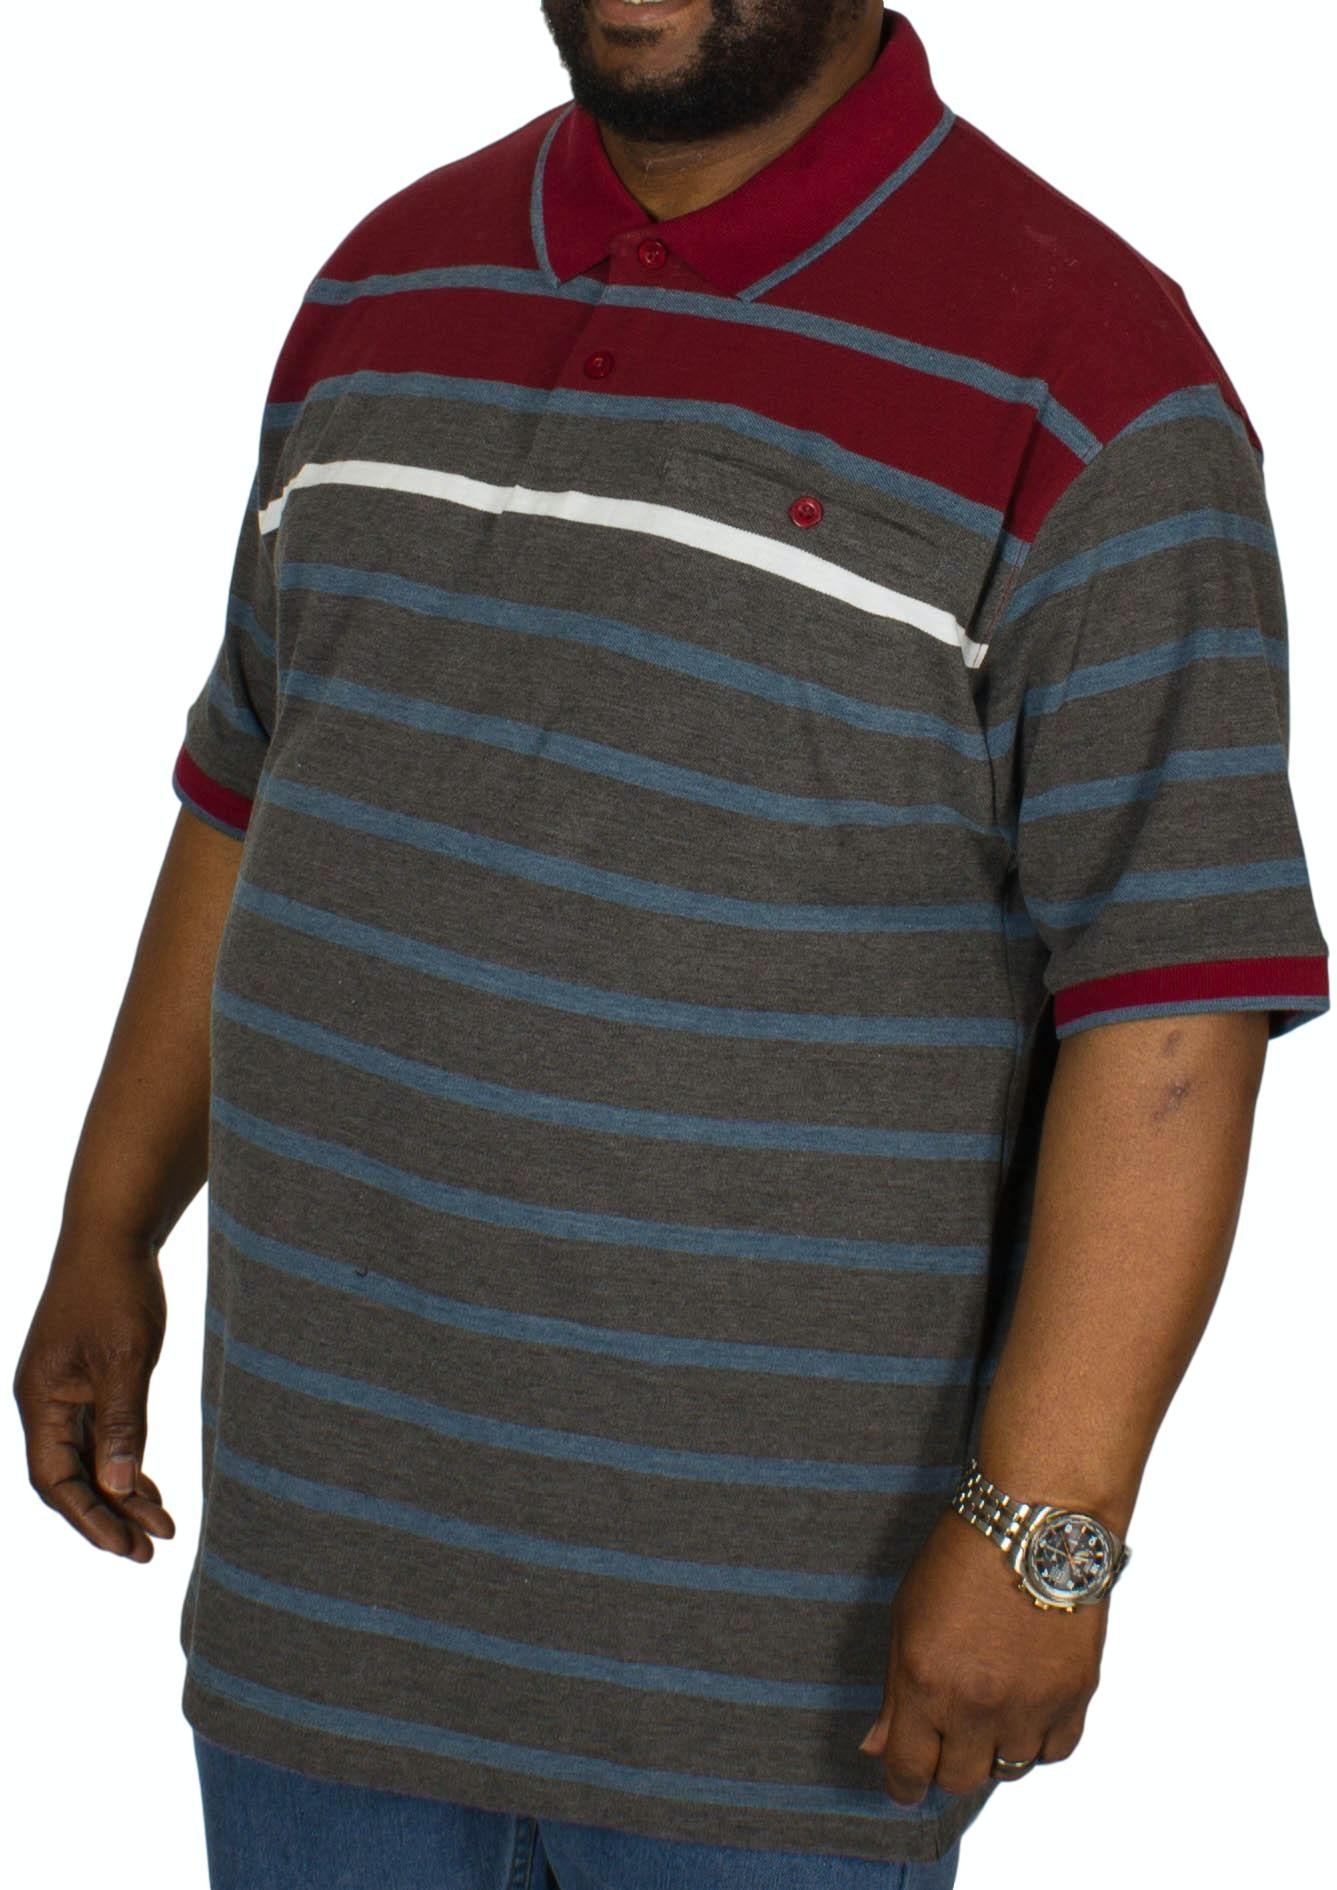 KAM Stripe Polo Shirt Burgundy